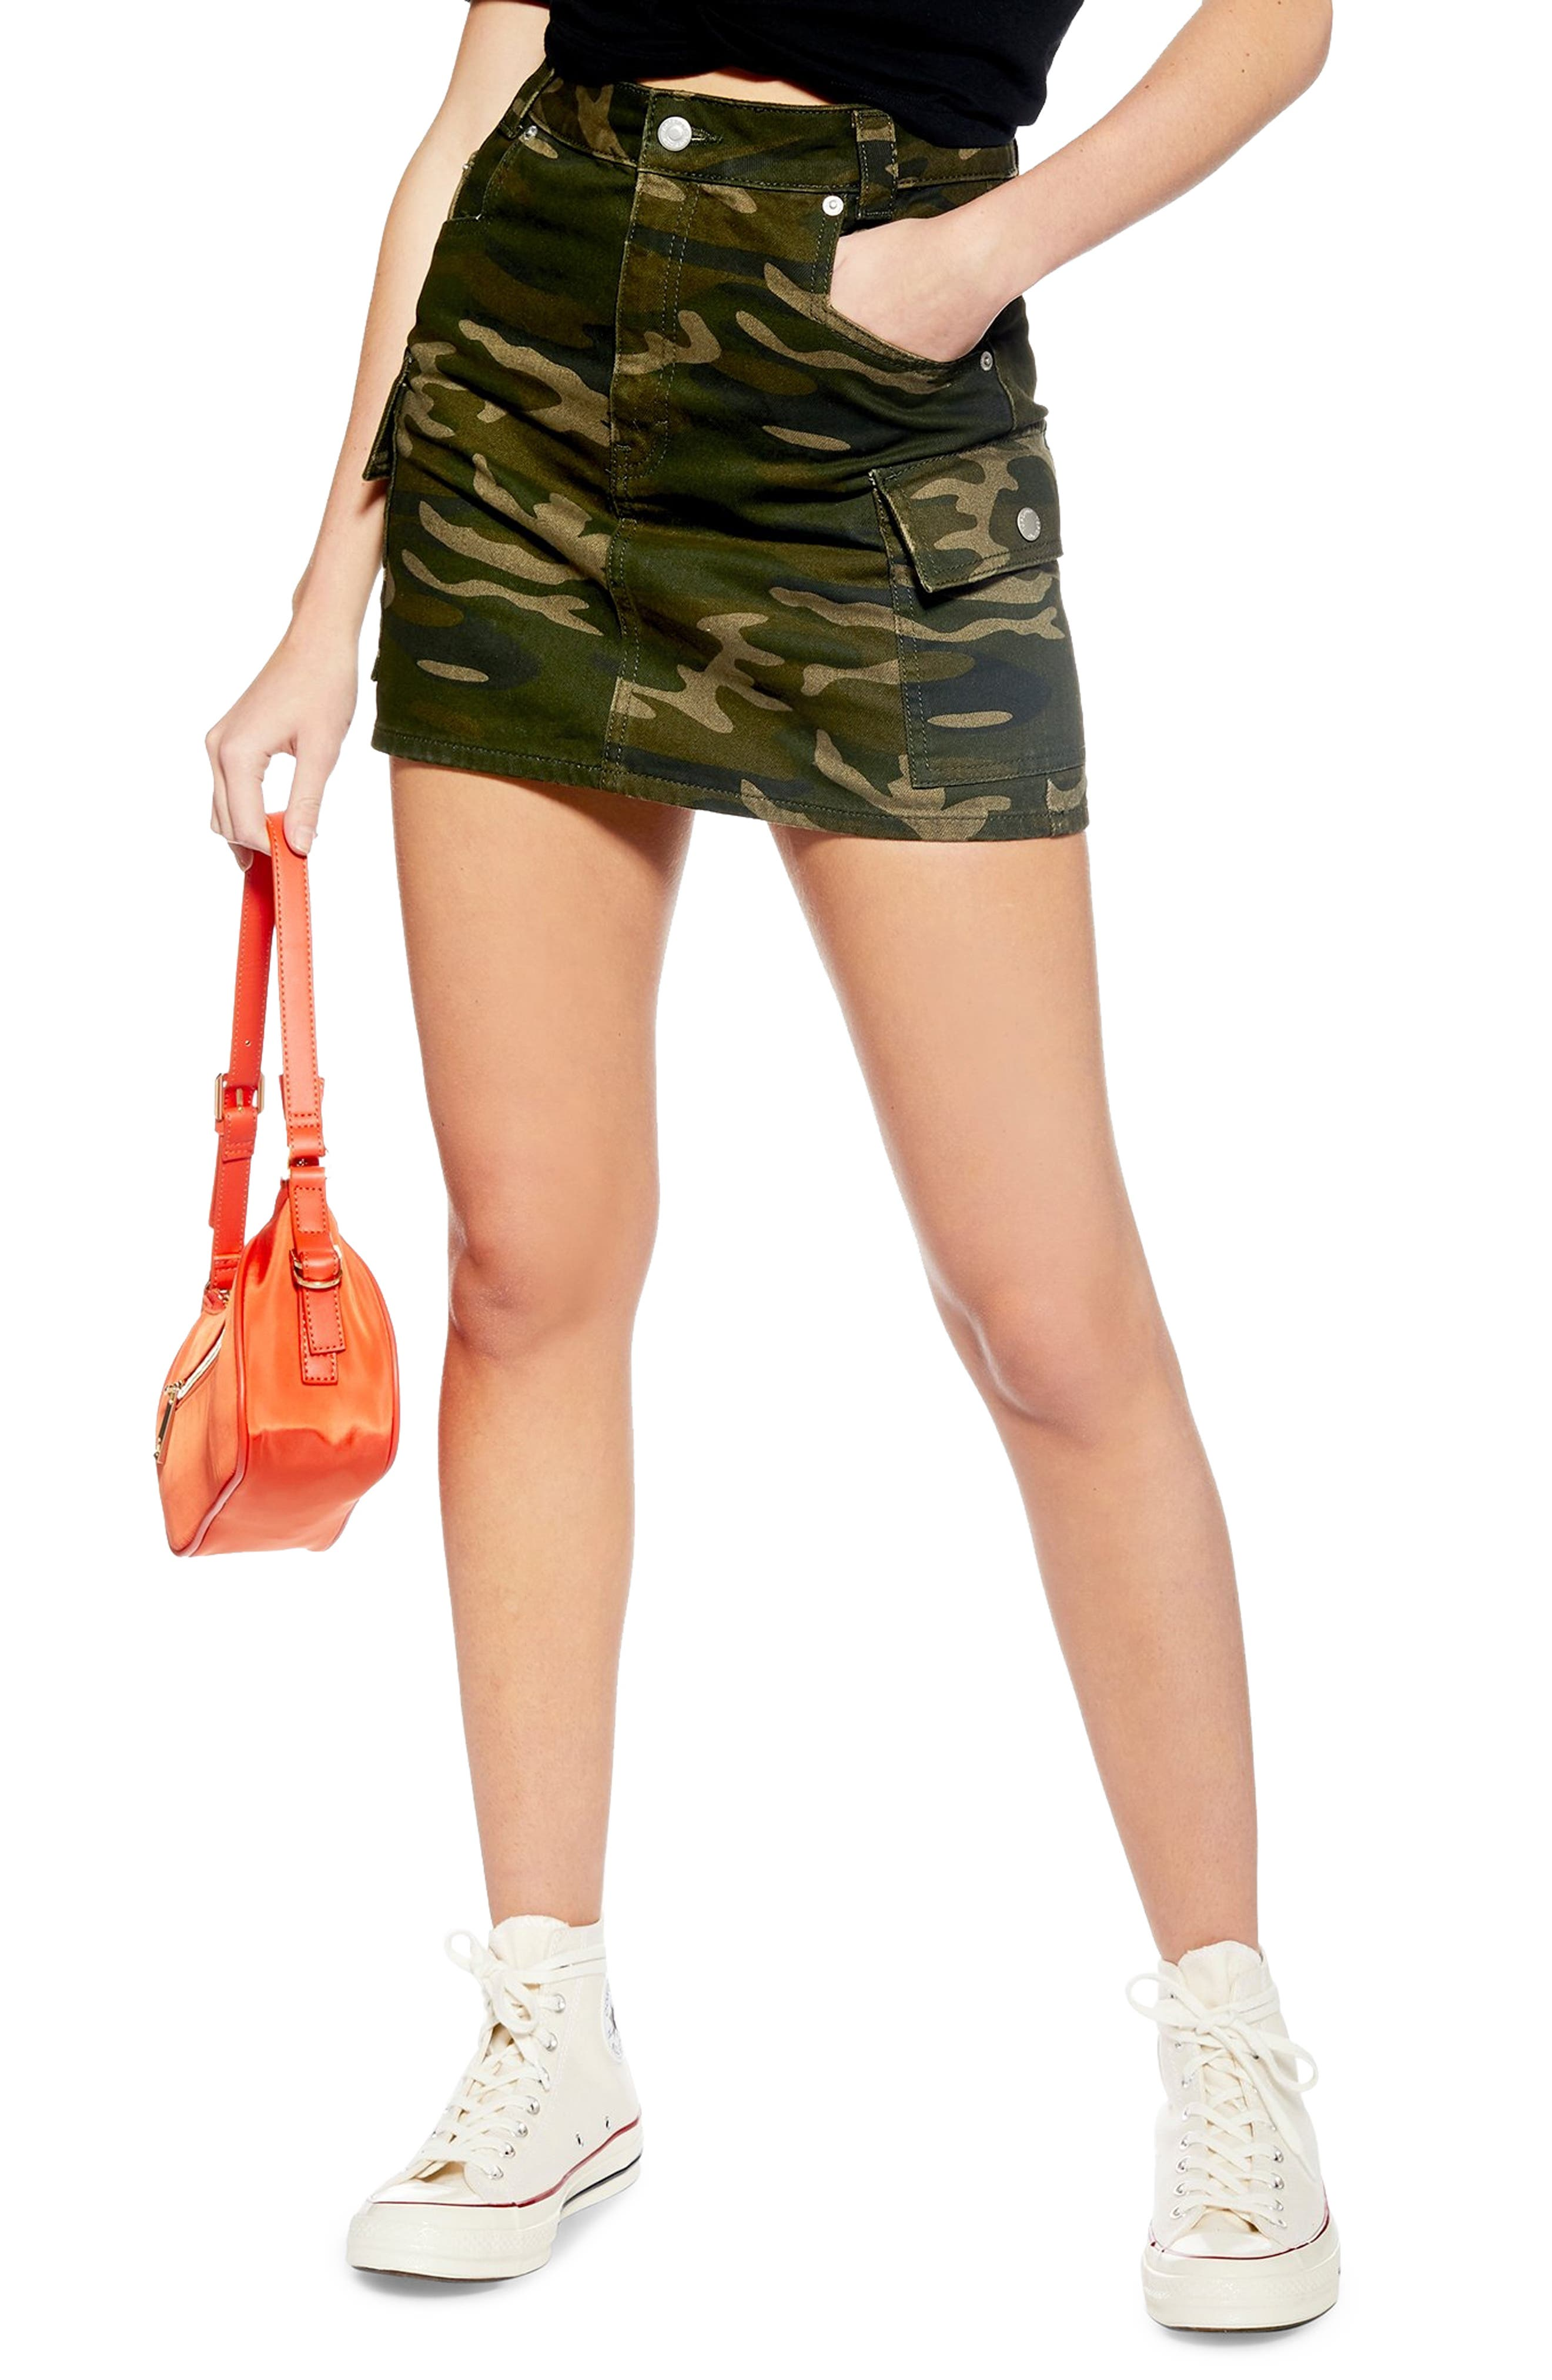 Topshop Camo Utility Skirt, US (fits like 0) - Green